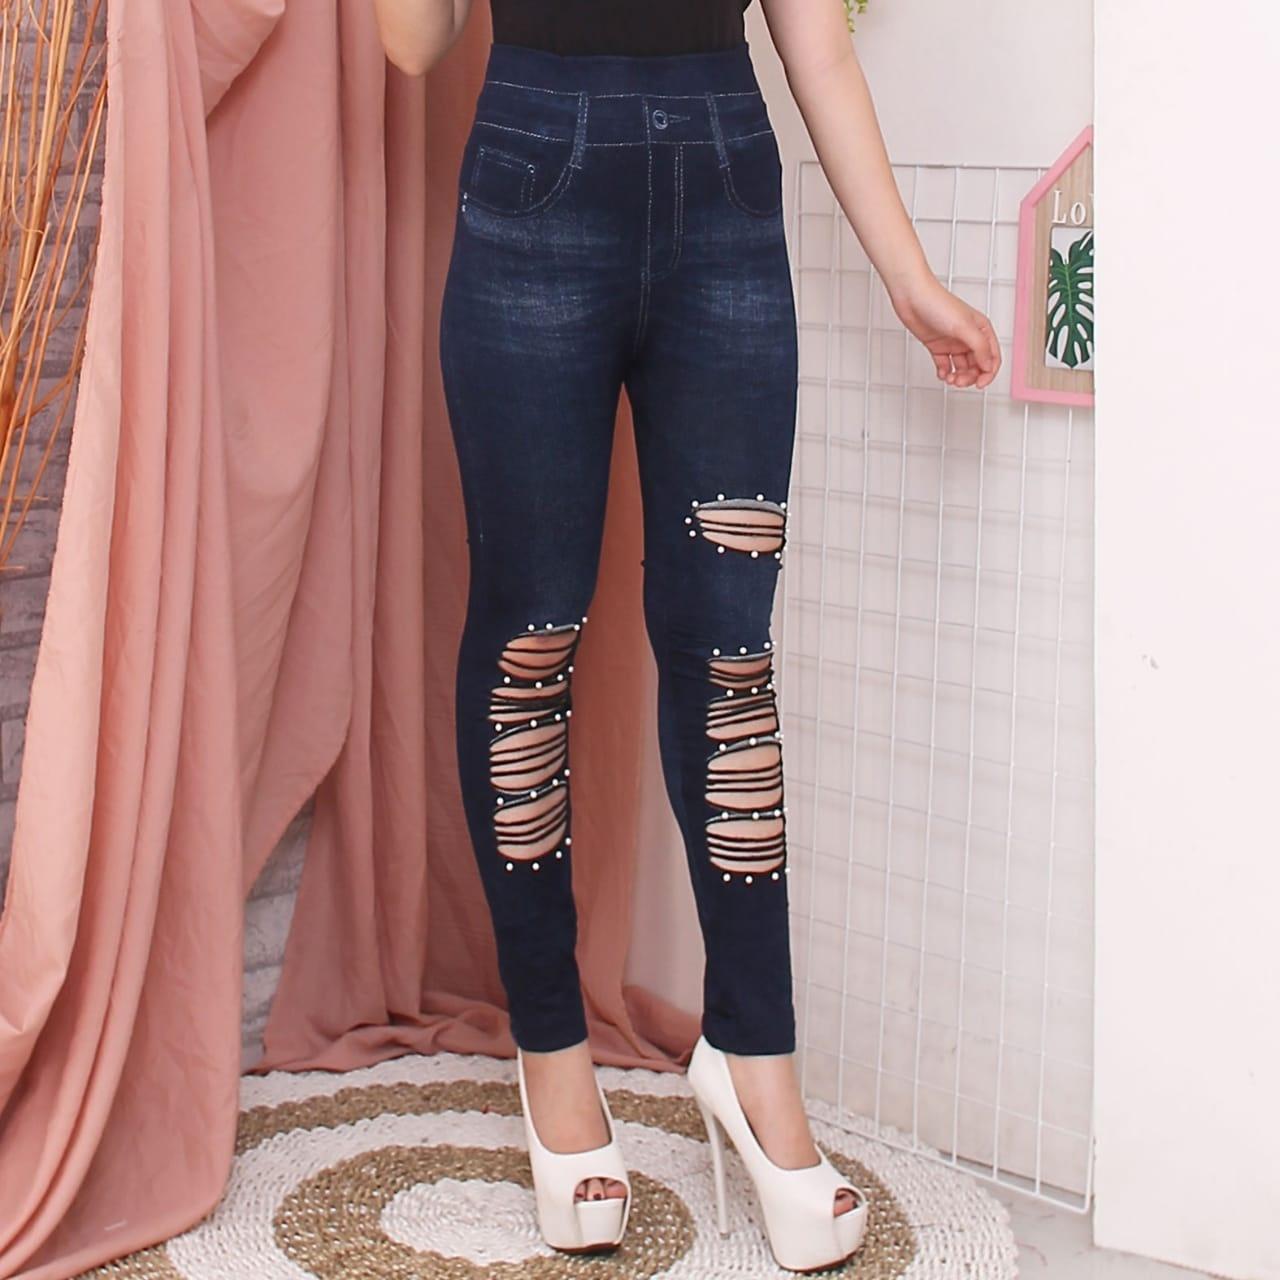 Chello Legging Sobek Celana Legging Legging Fashion Legging Panjang Legging Polos Legging Motif Legging Robek Legging Wudhu Legging Size Besar Dalaman Wanita Legging Import Fashion Wanita Bawahan Wanita Lazada Indonesia